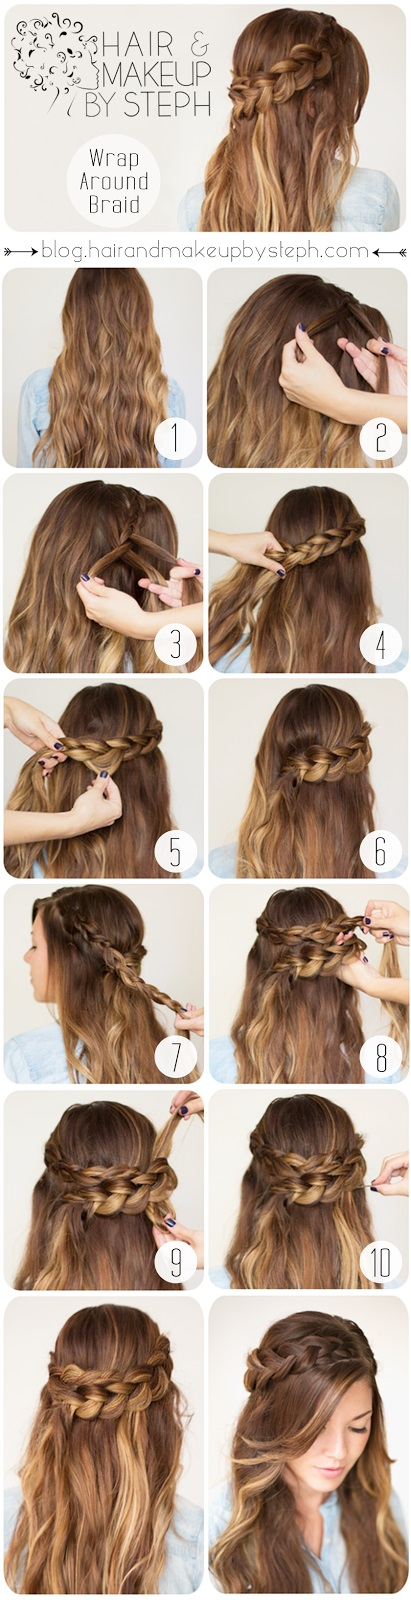 Amazing Braid Hair Tutorials 12 Ways To Braid Your Hair Hairstyles Weekly Short Hairstyles For Black Women Fulllsitofus